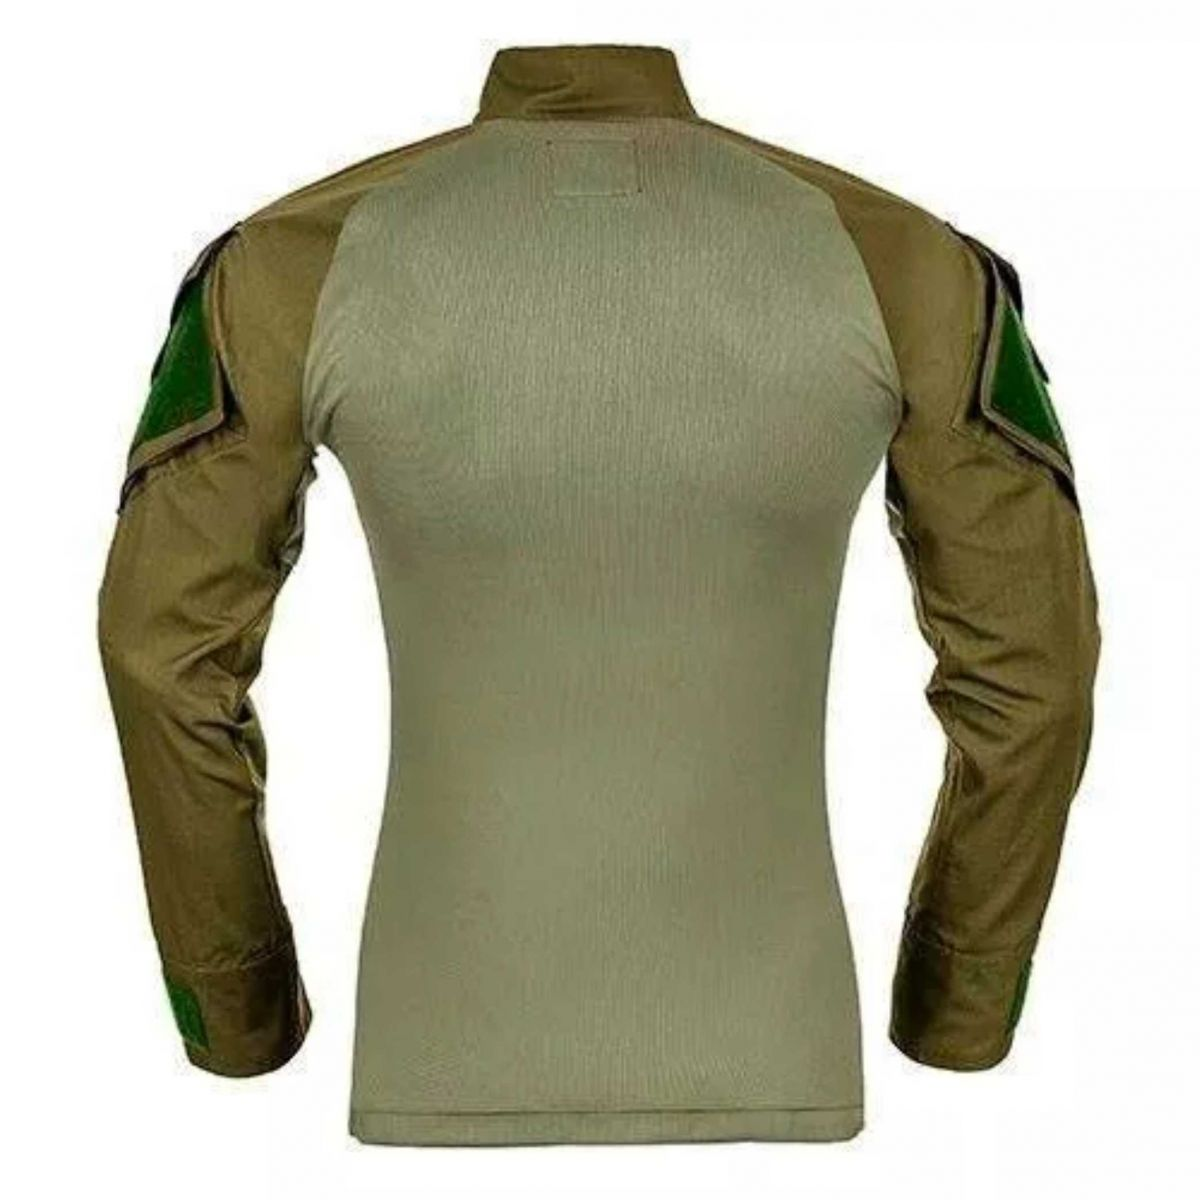 Camisa Raptor tática militar airsoft Paintball  Invictus